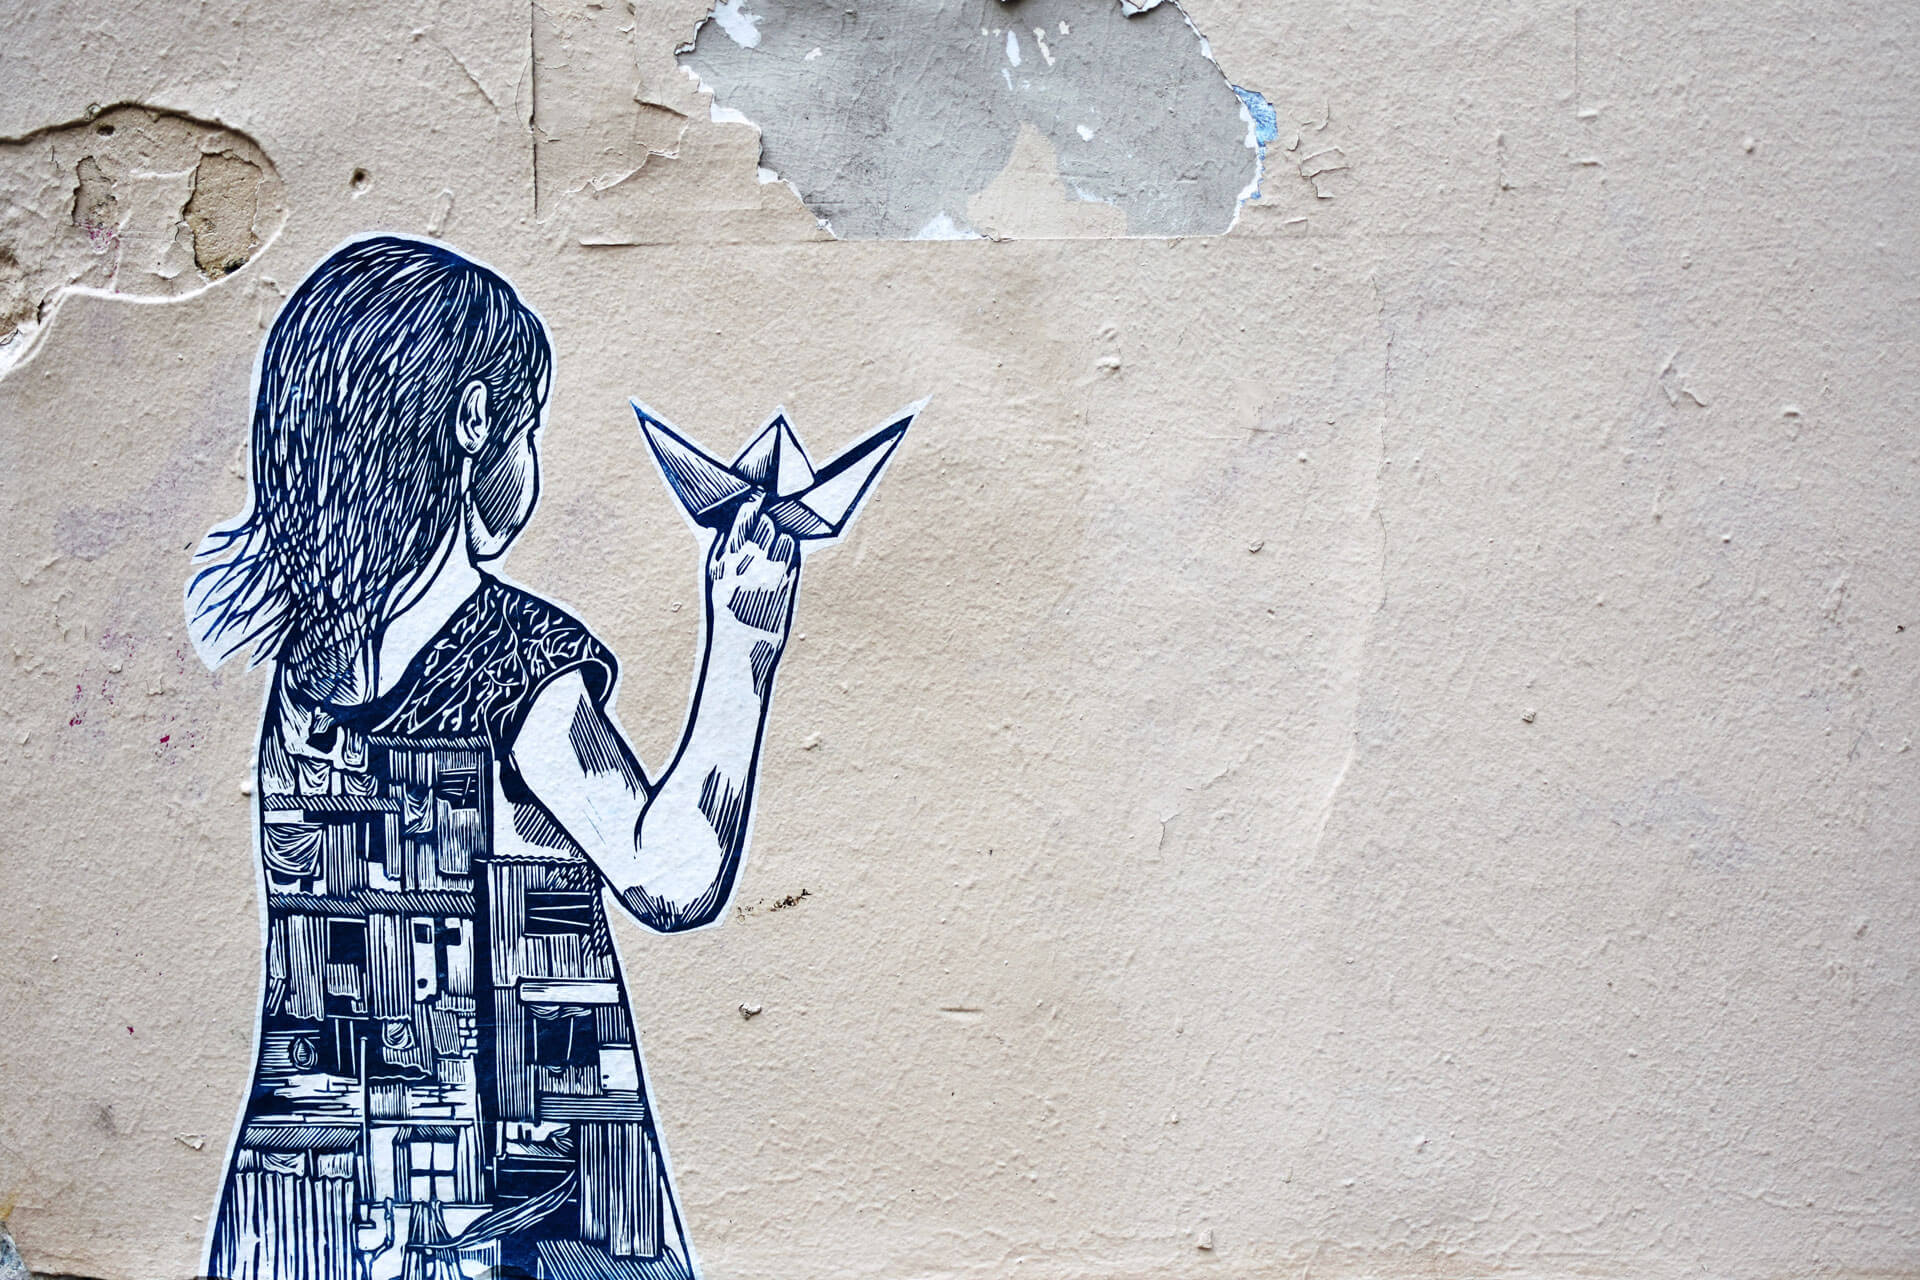 Streetart in Montmartre